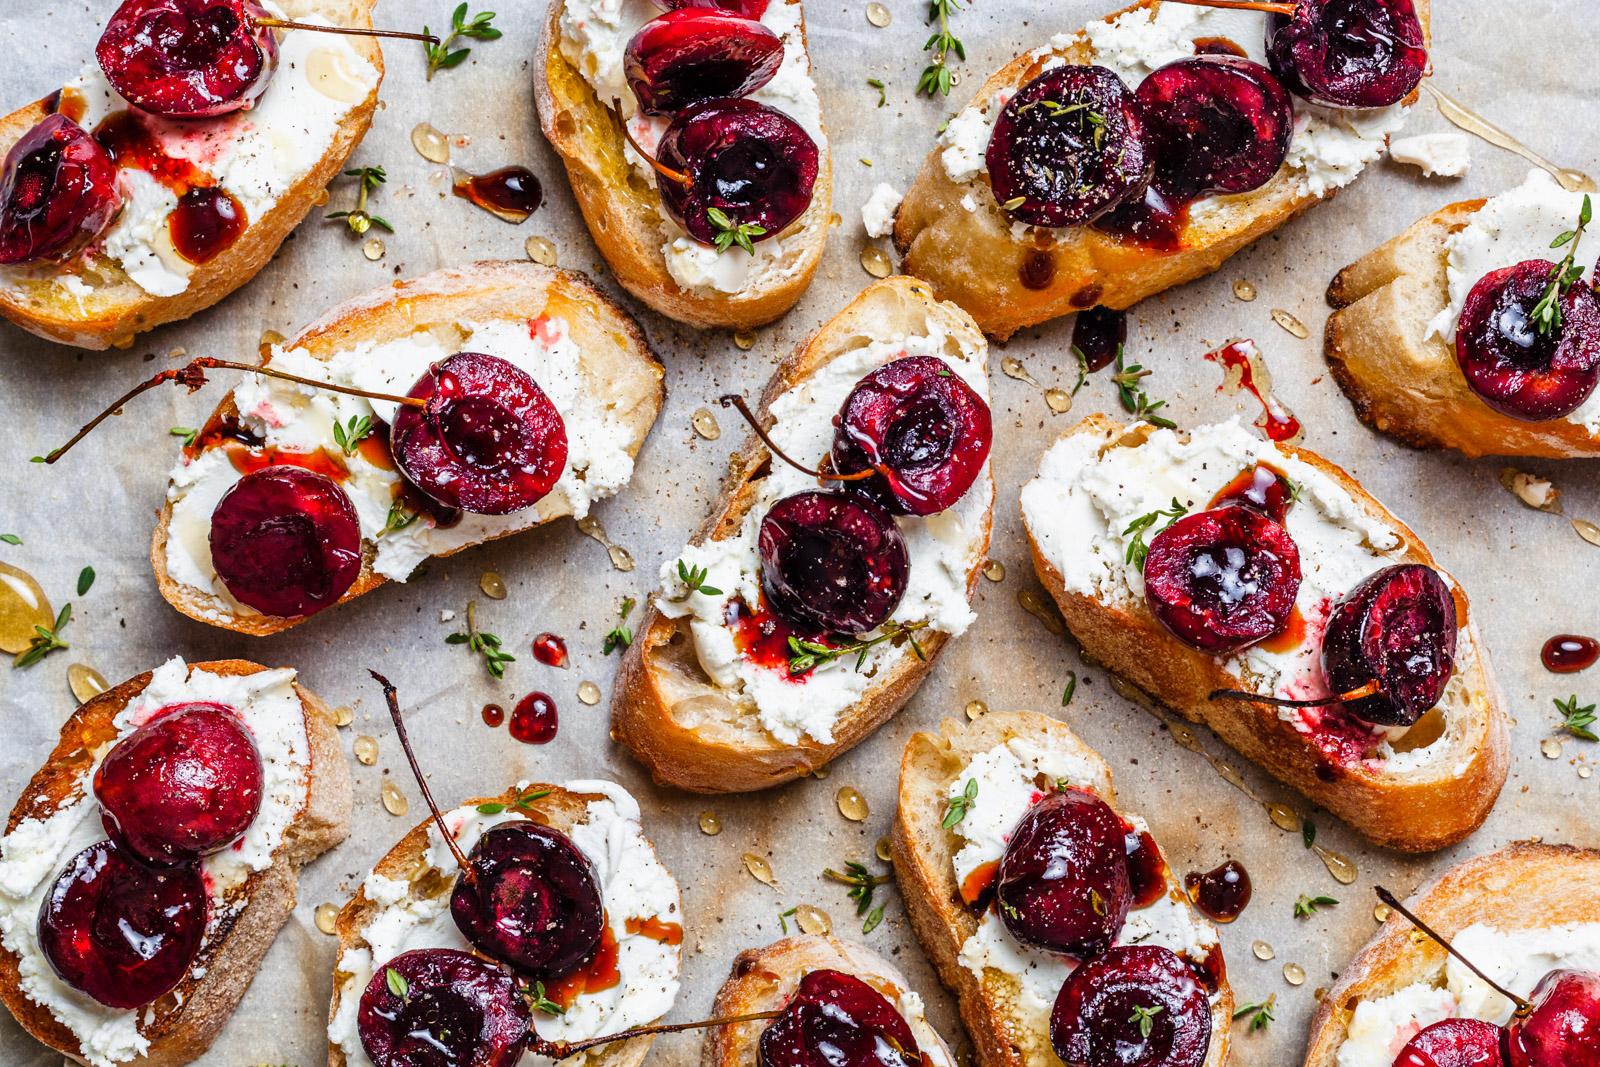 Balsamic Roasted Cherry and Goat Cheese Crostini